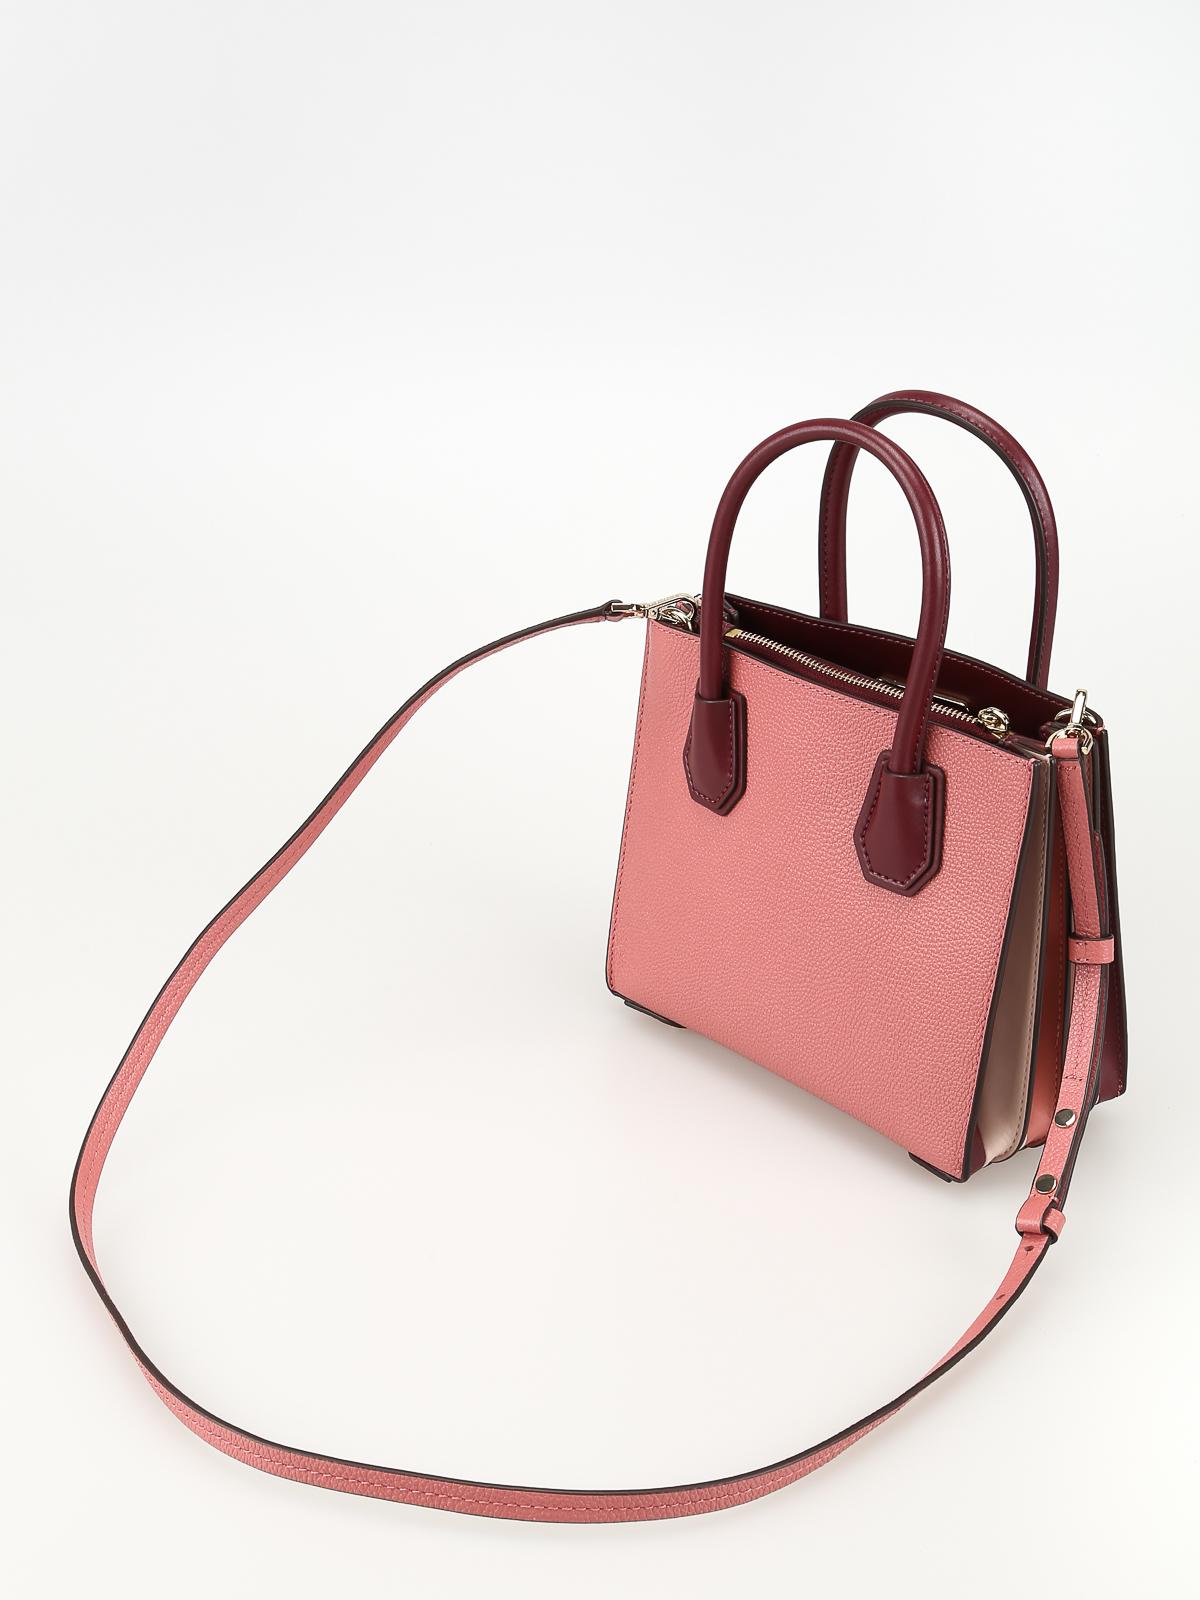 530ddf397267c iKRIX MICHAEL KORS  cross body bags - Mercer medium accordion messenger bag